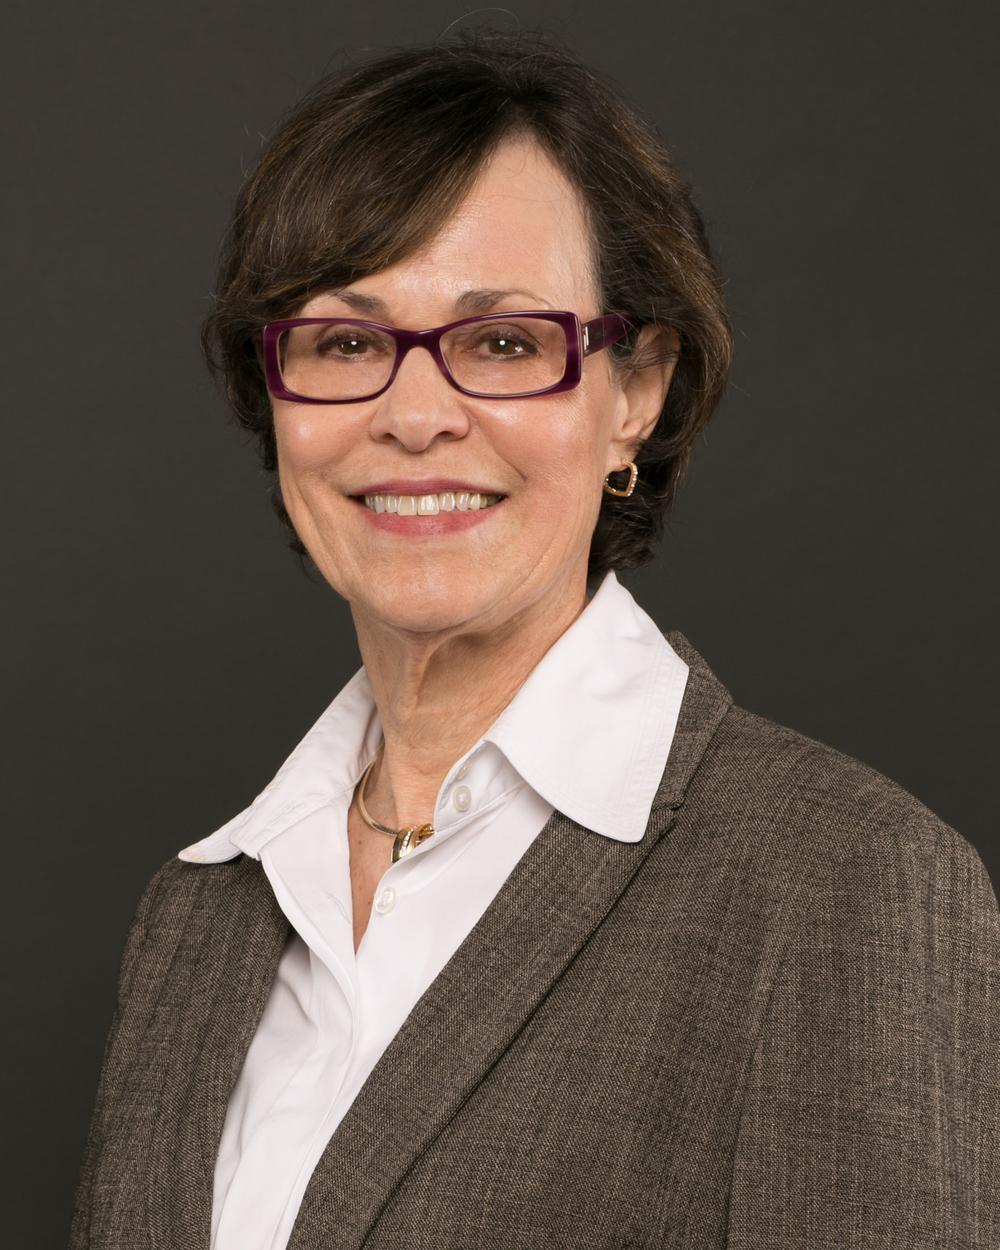 VICKI P. SCHULTZ, MBA, CFP®